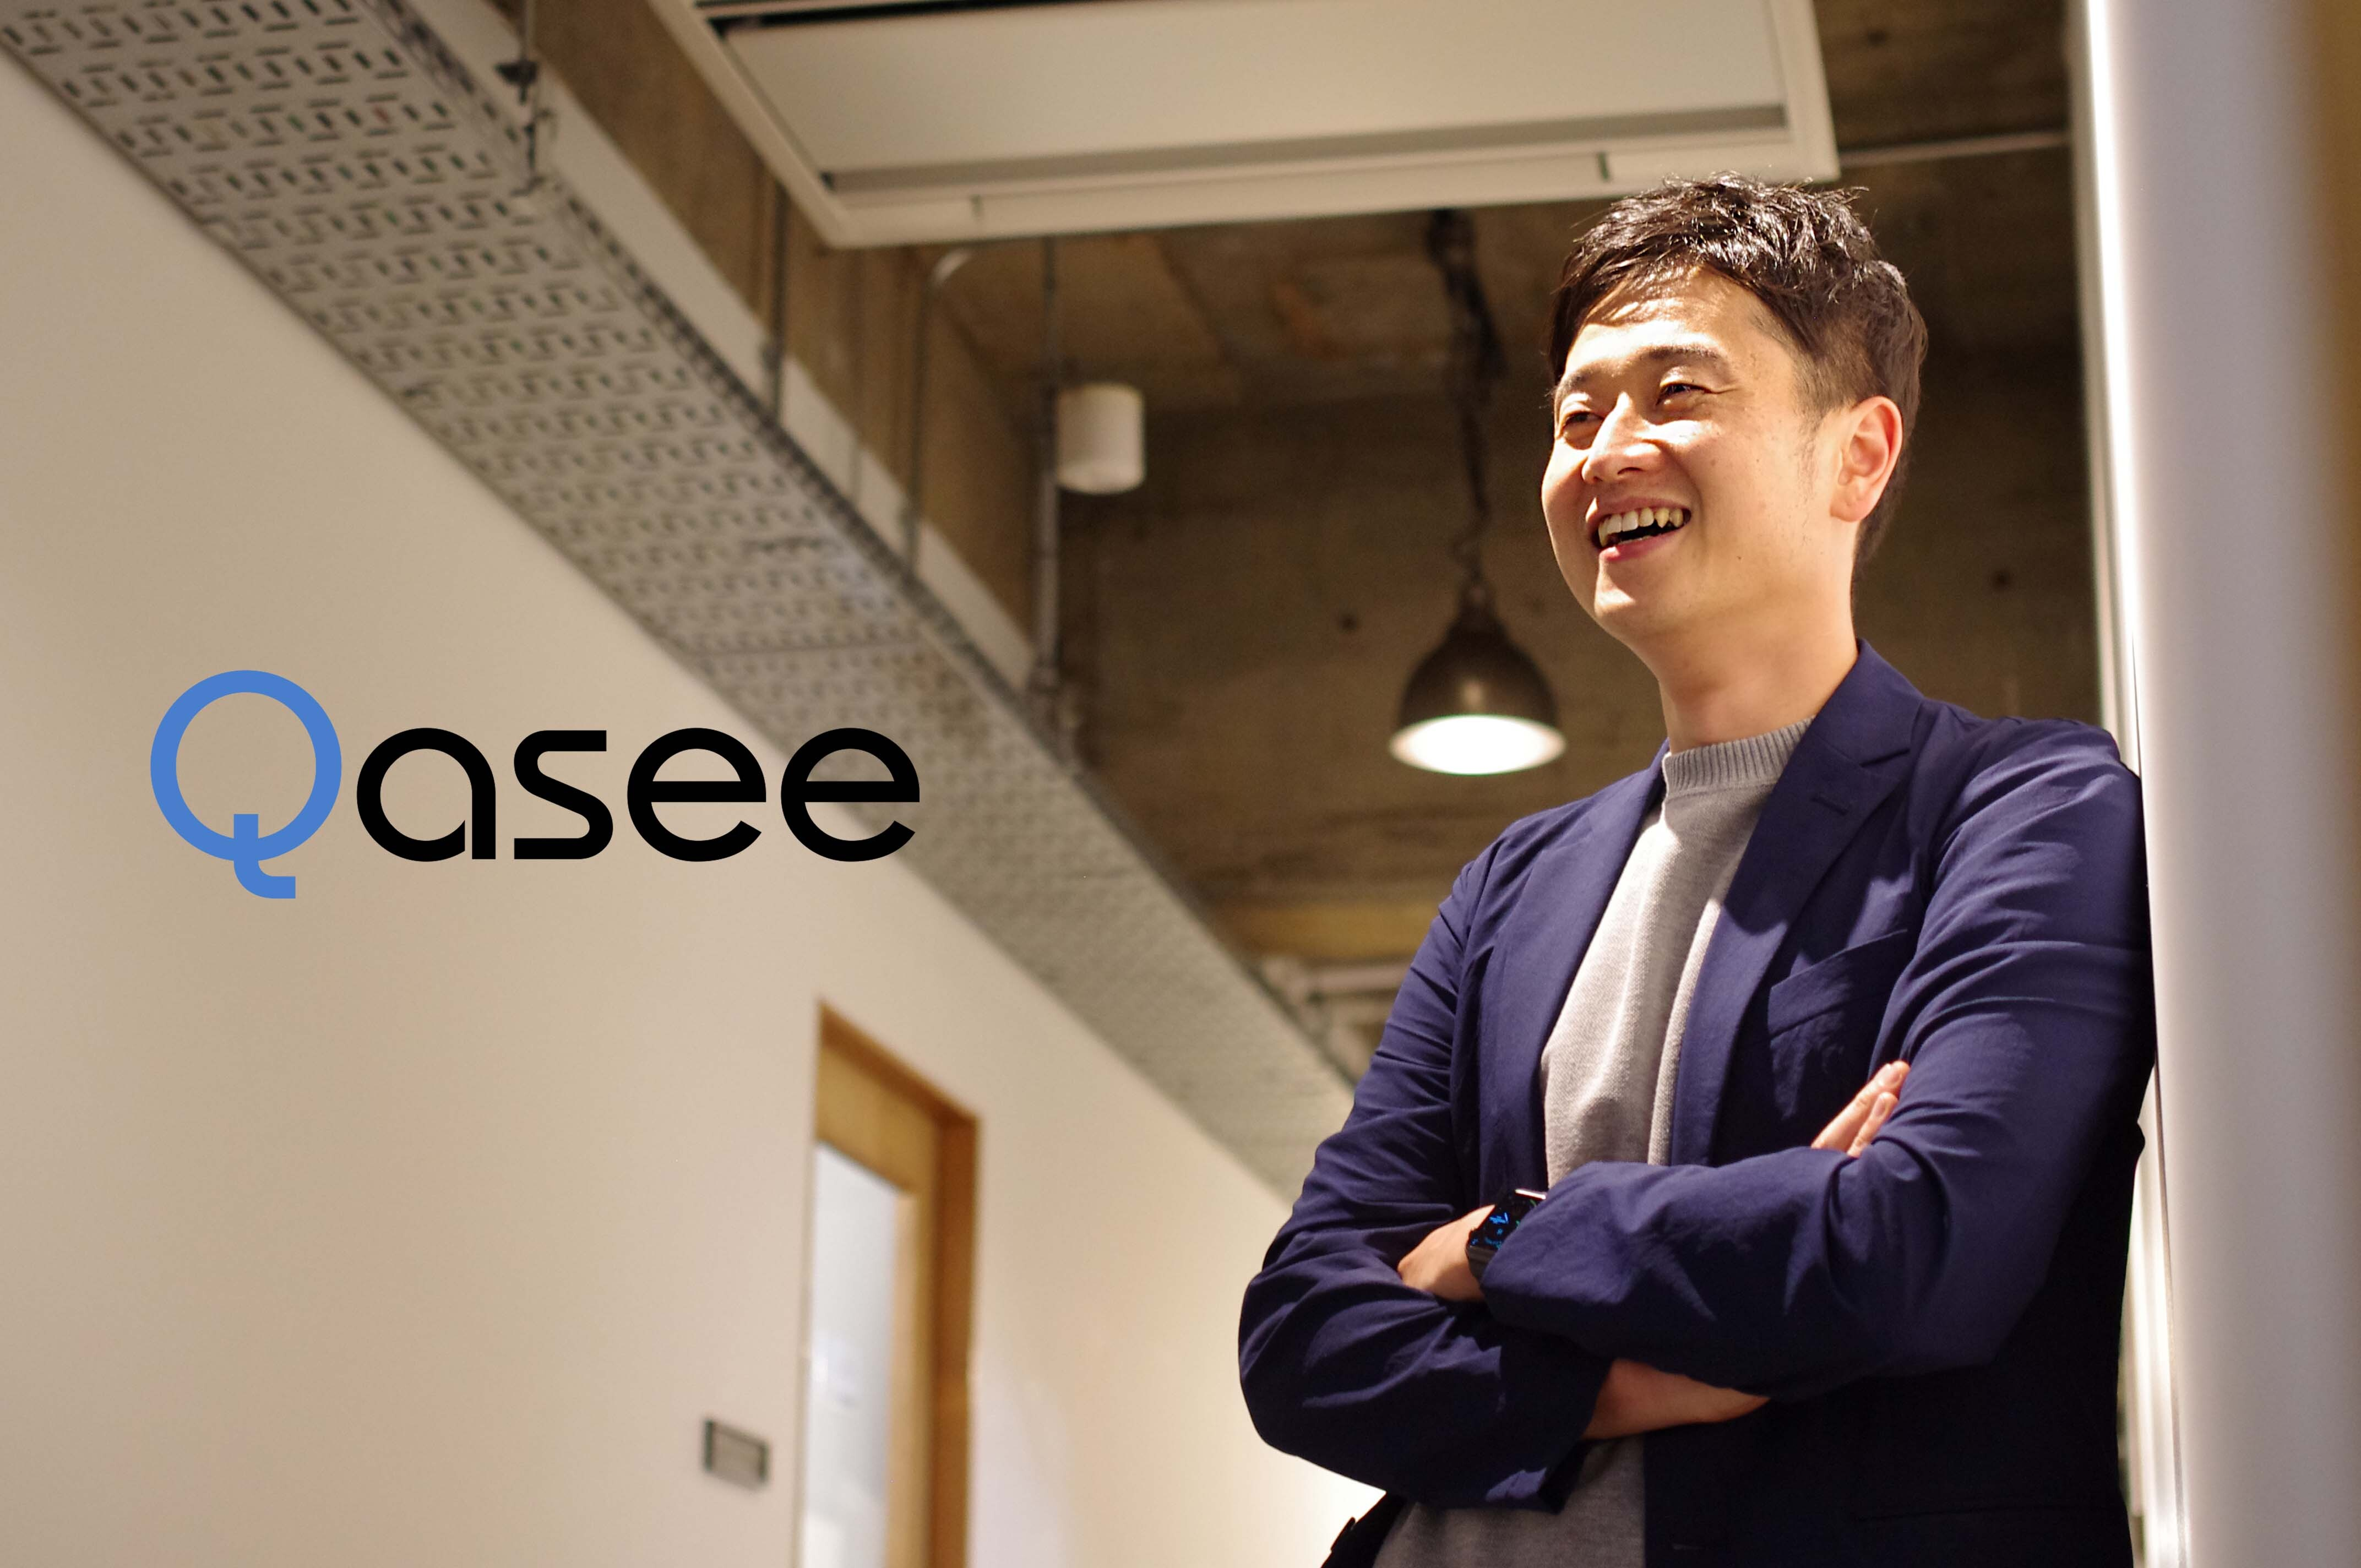 Qasee株式会社 代表取締役 村田 敦様